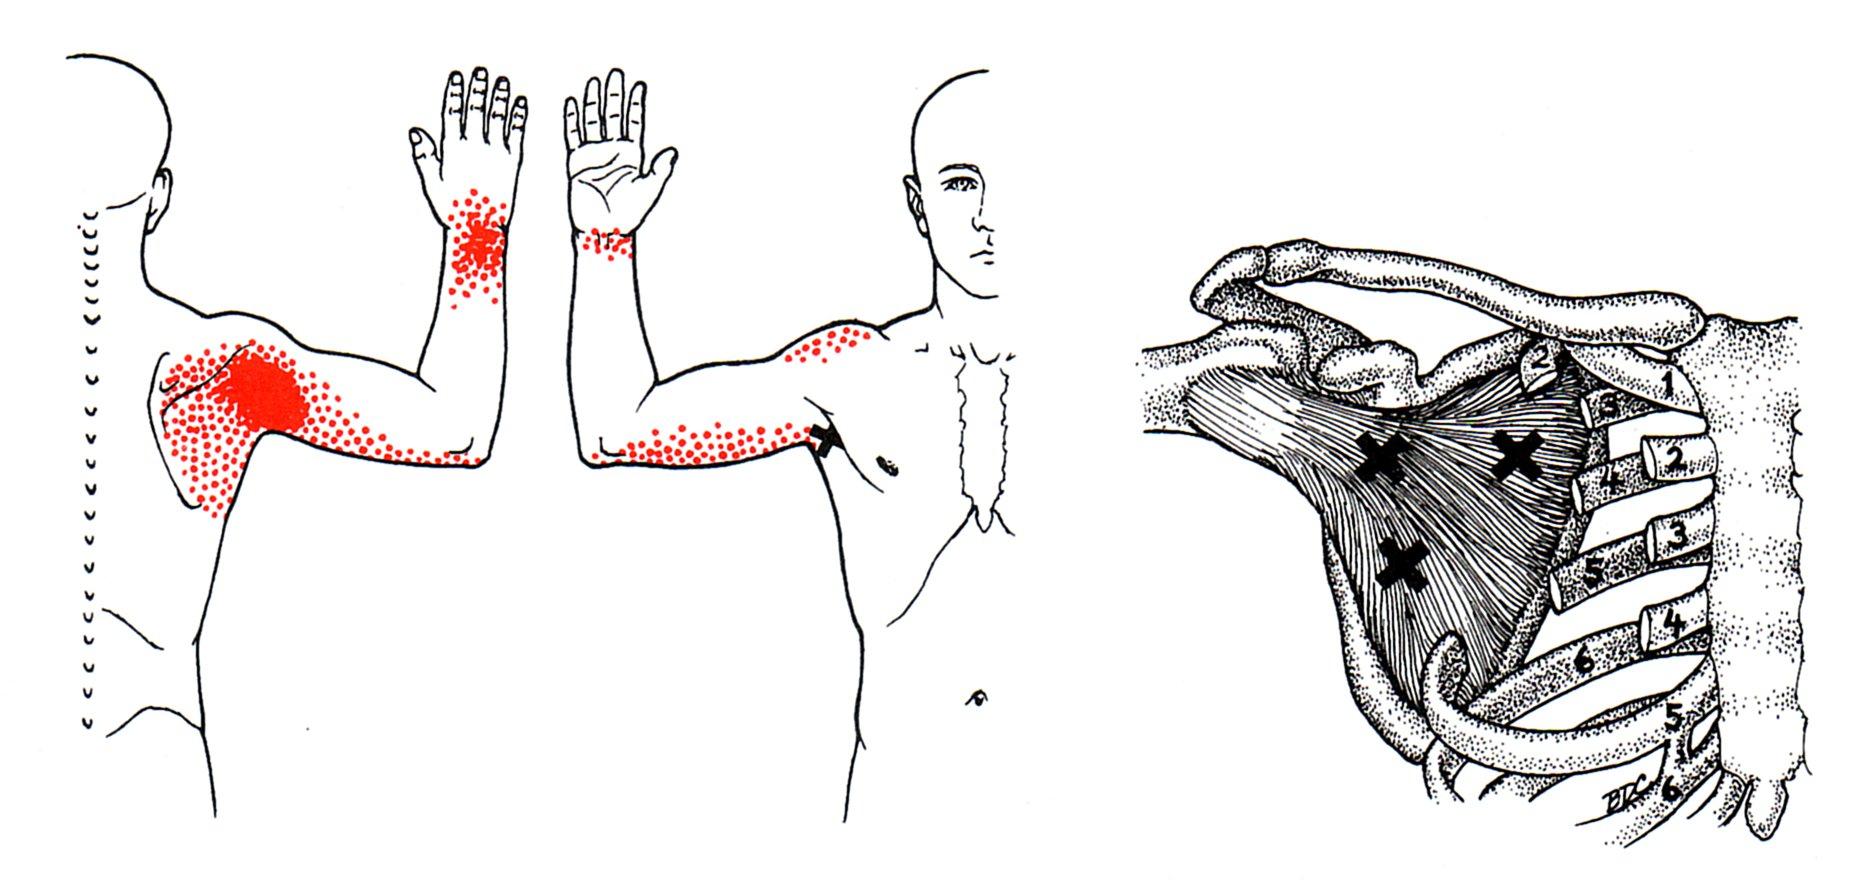 Subscapularis - Rotator Cuff Muscle - Yoganatomy